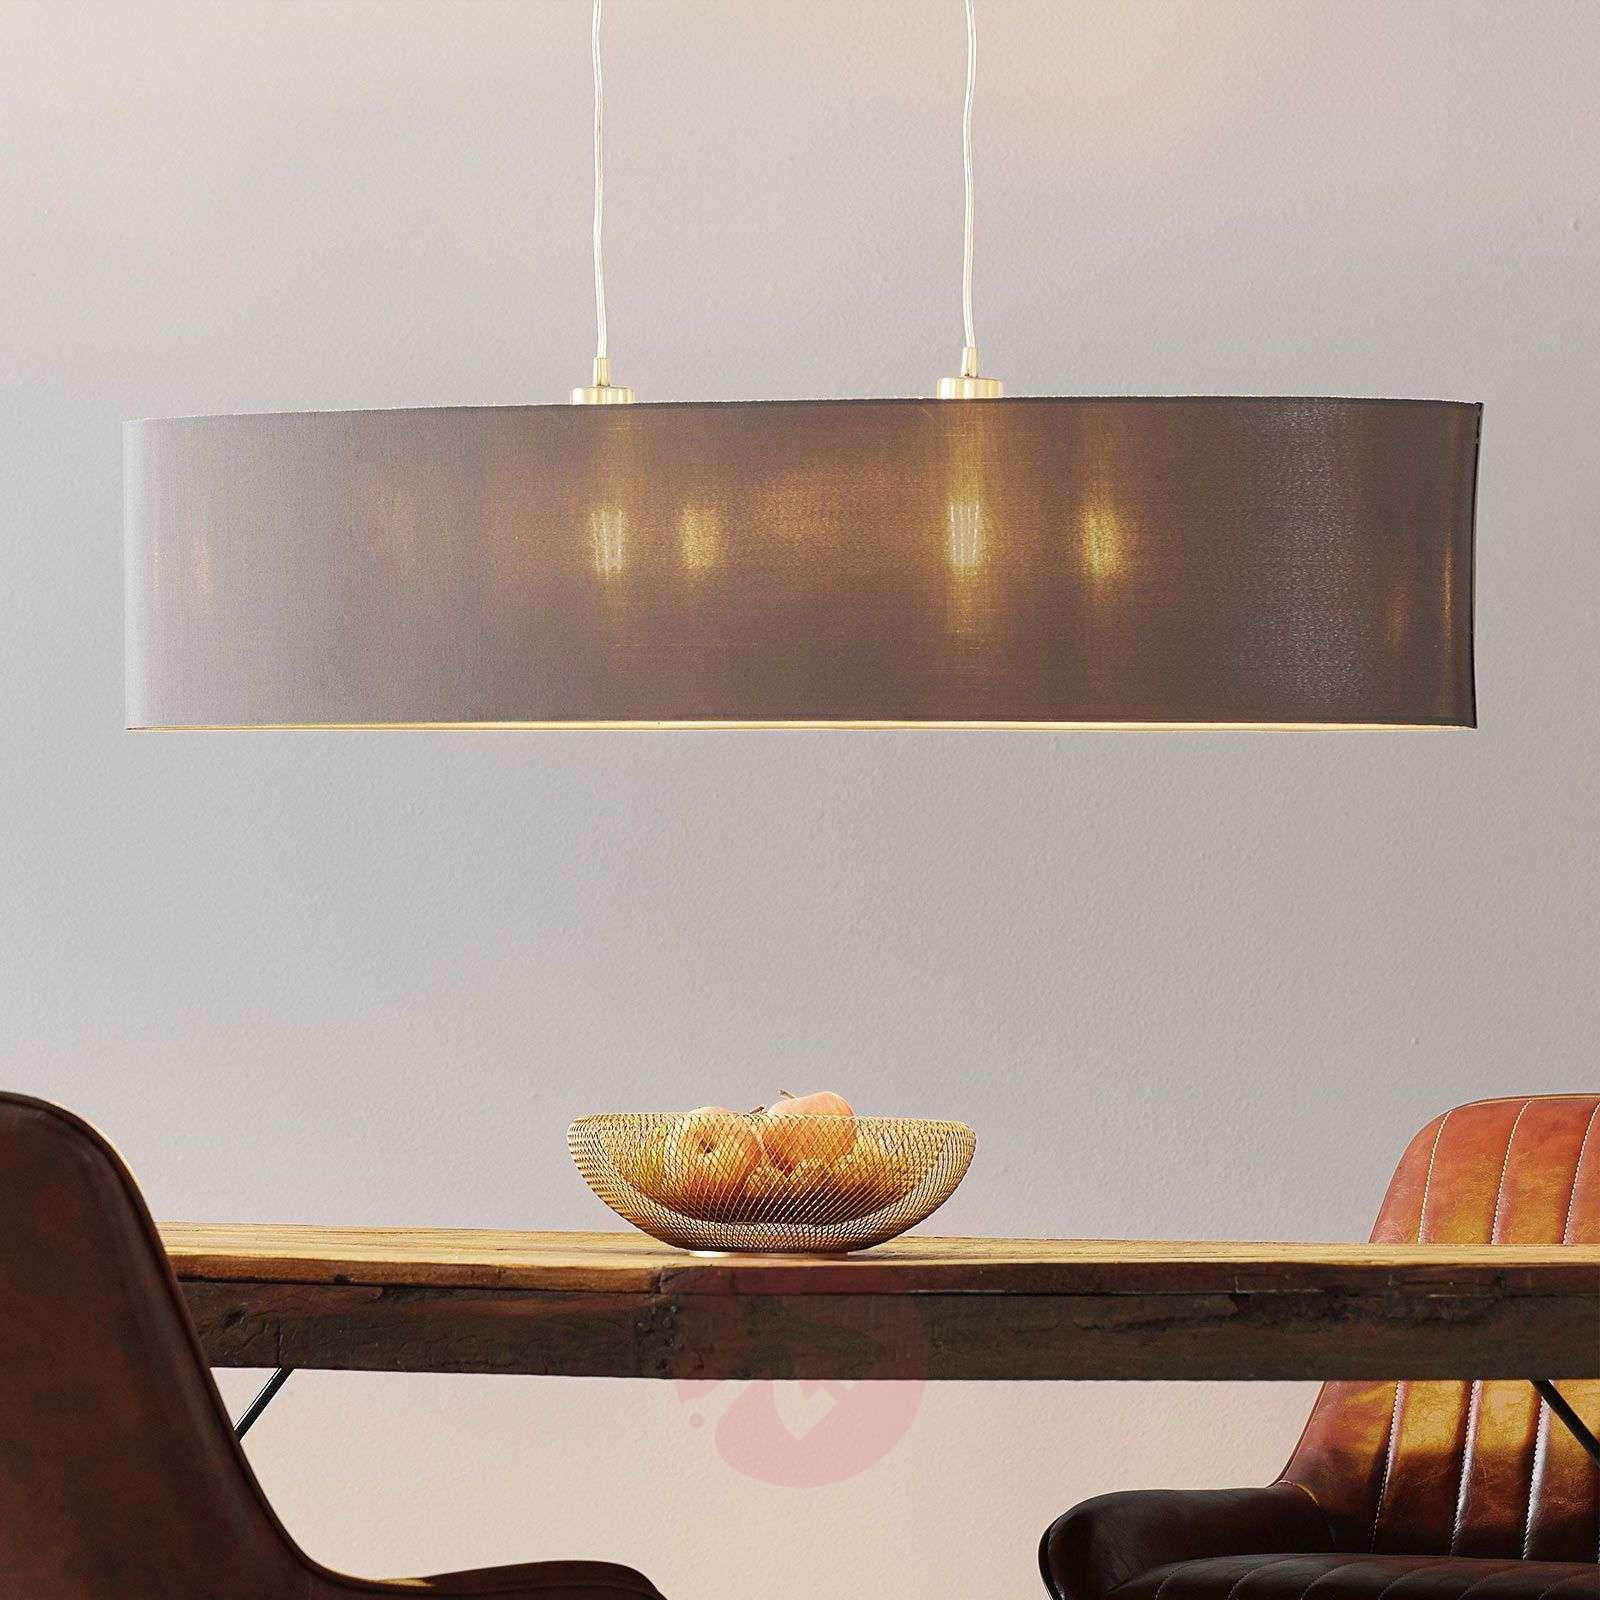 Carpi oval fabric hanging light, 100cm long-3031704-01